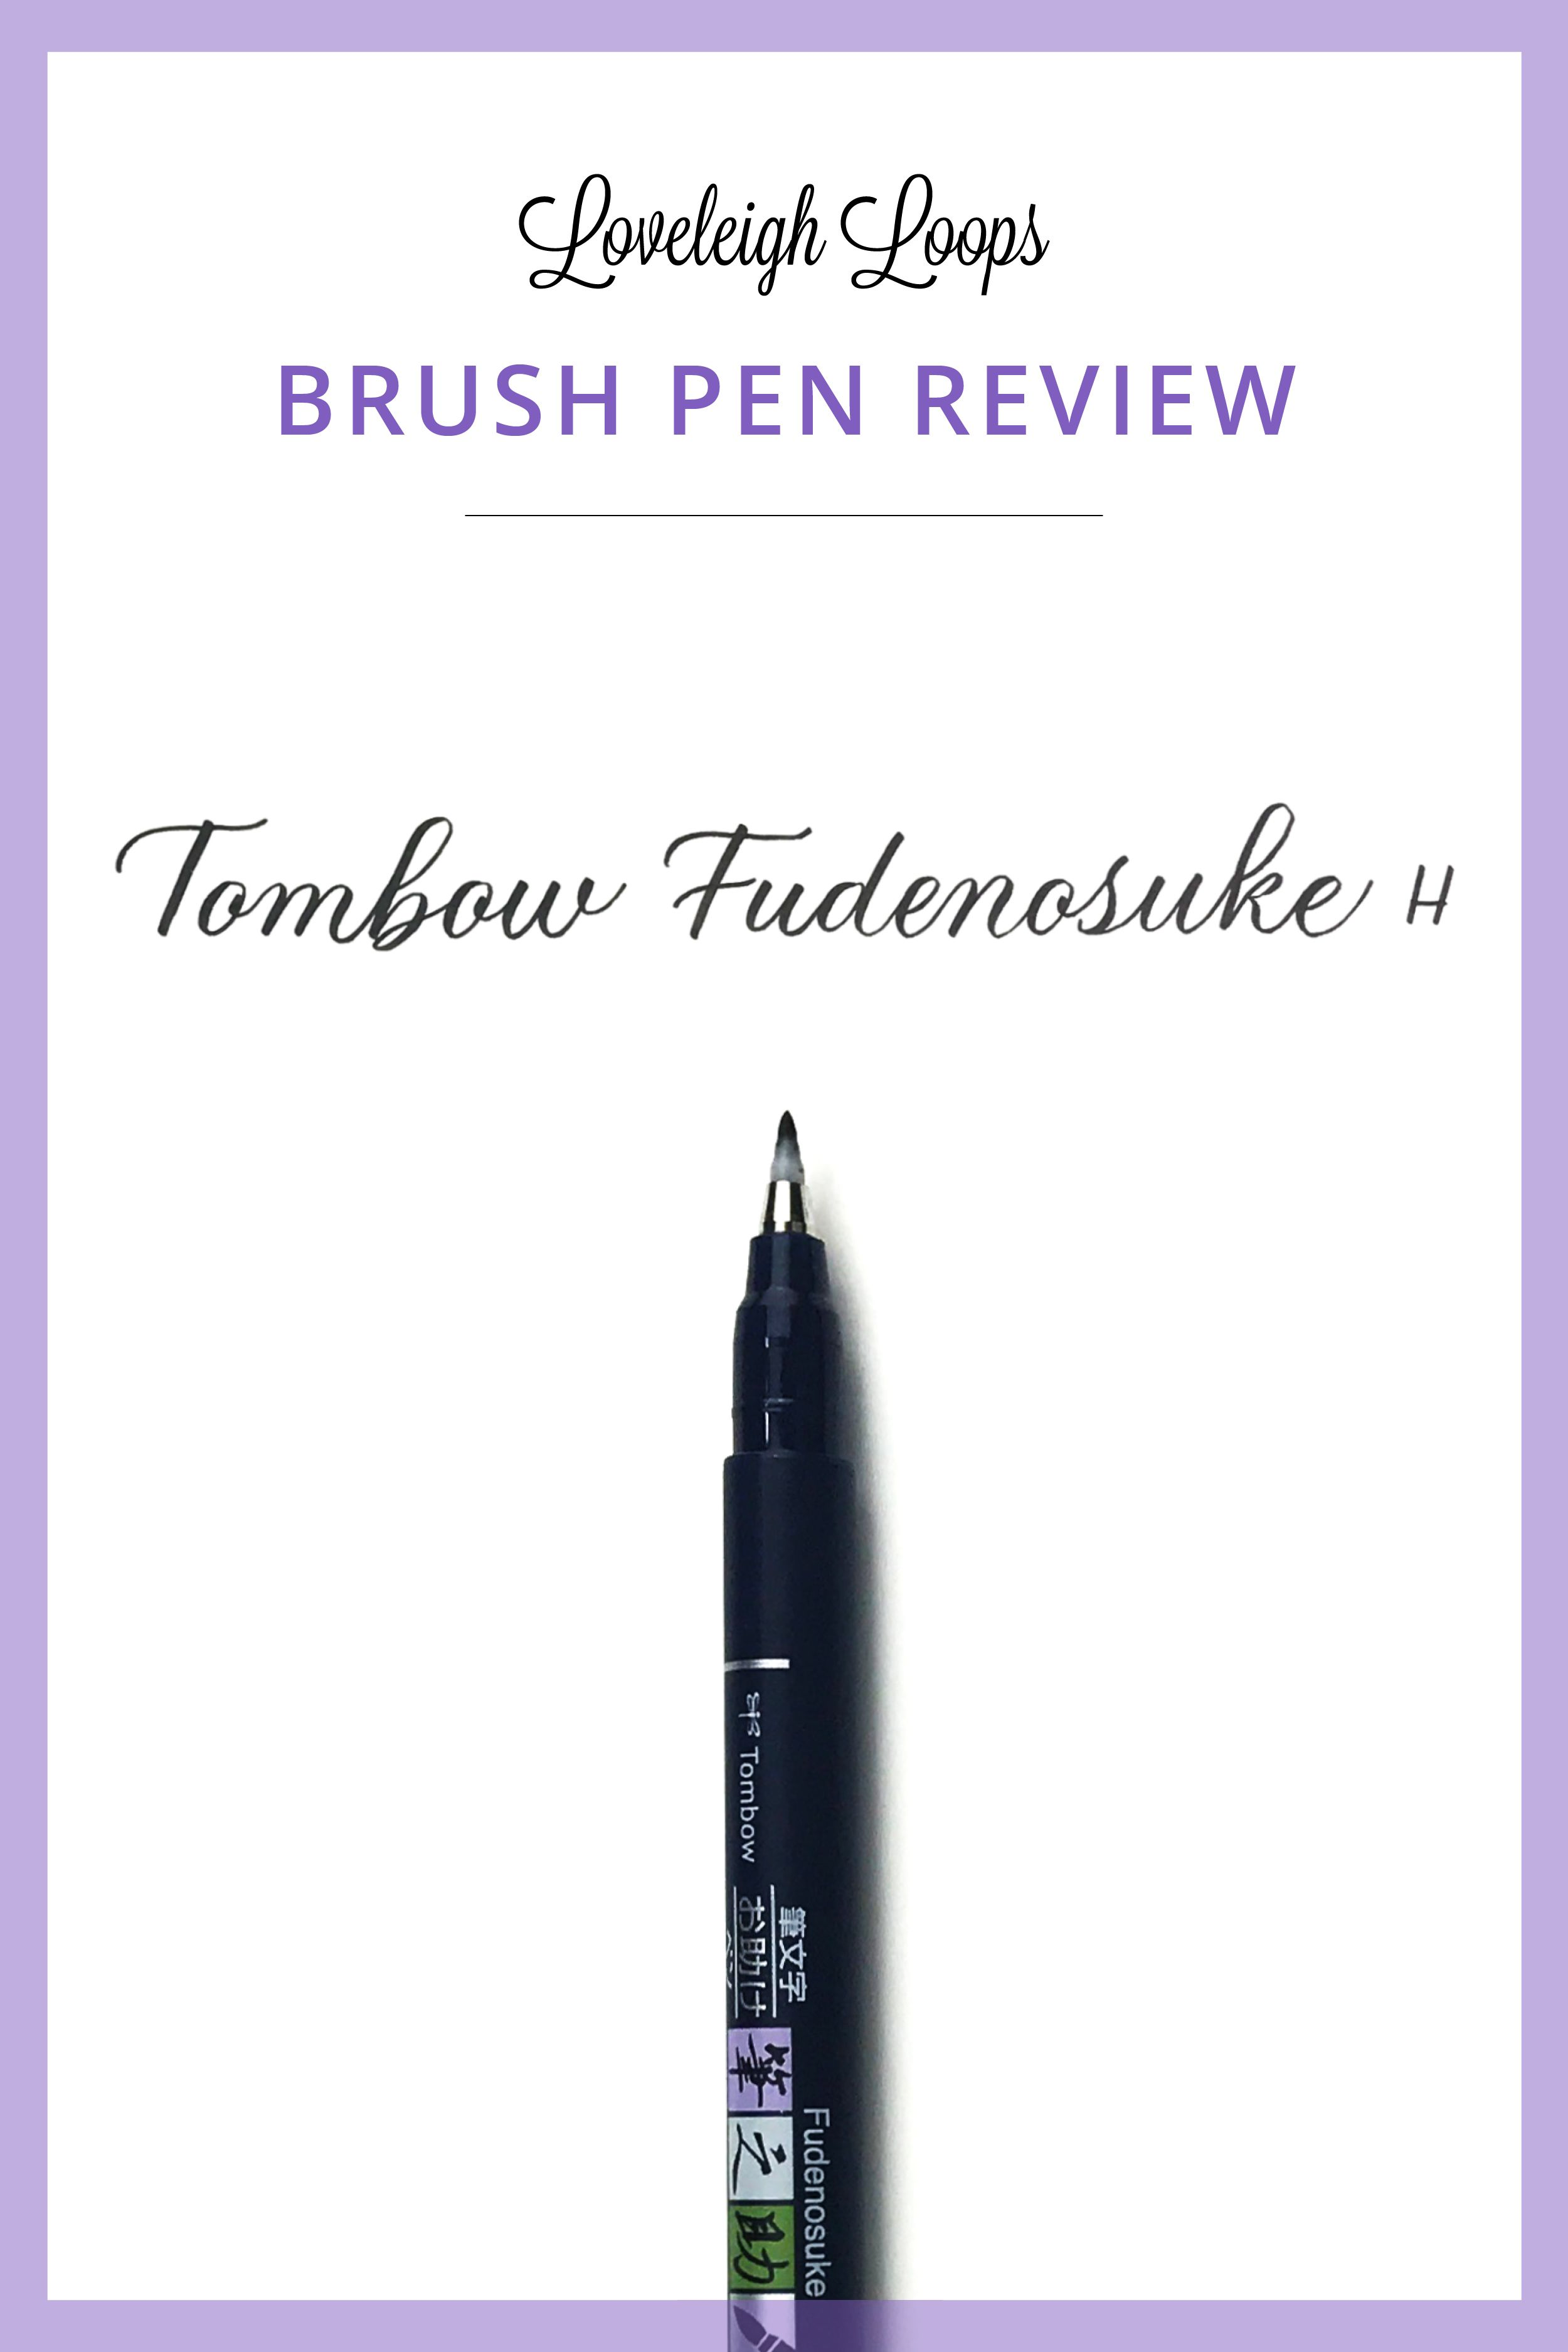 Tombow Fudenosuke Brush Pen Demonstration And Review